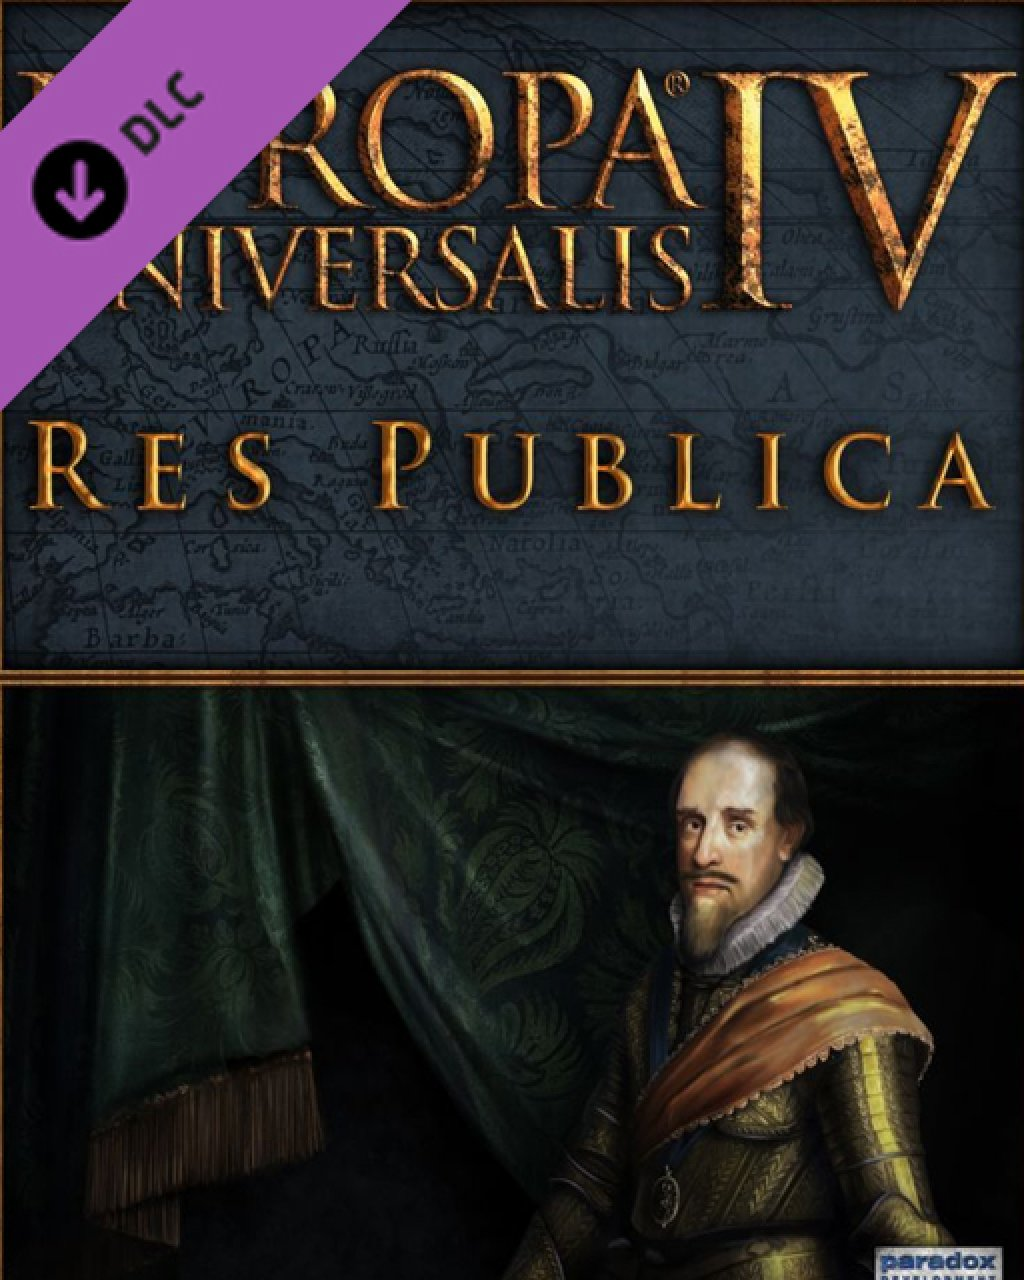 Europa Universalis IV Res Publica